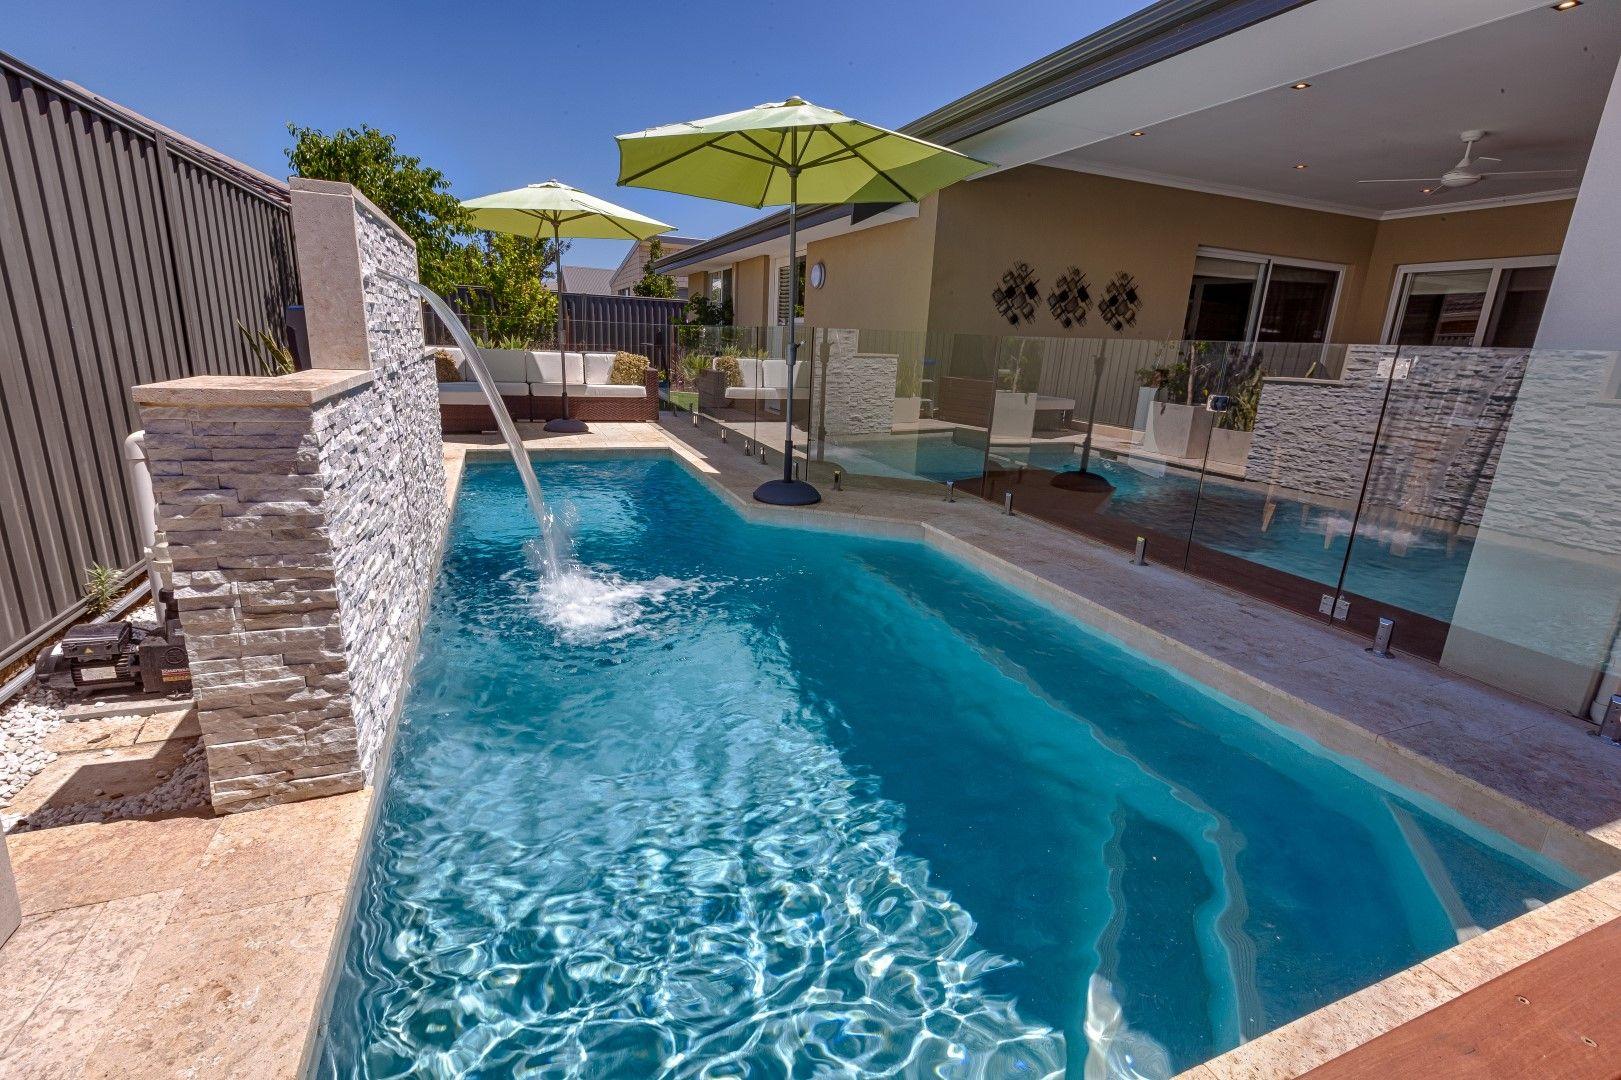 Concretepool #swimmingpool #freedompools | Piscine Et Jardin ... intérieur Freedom Piscine